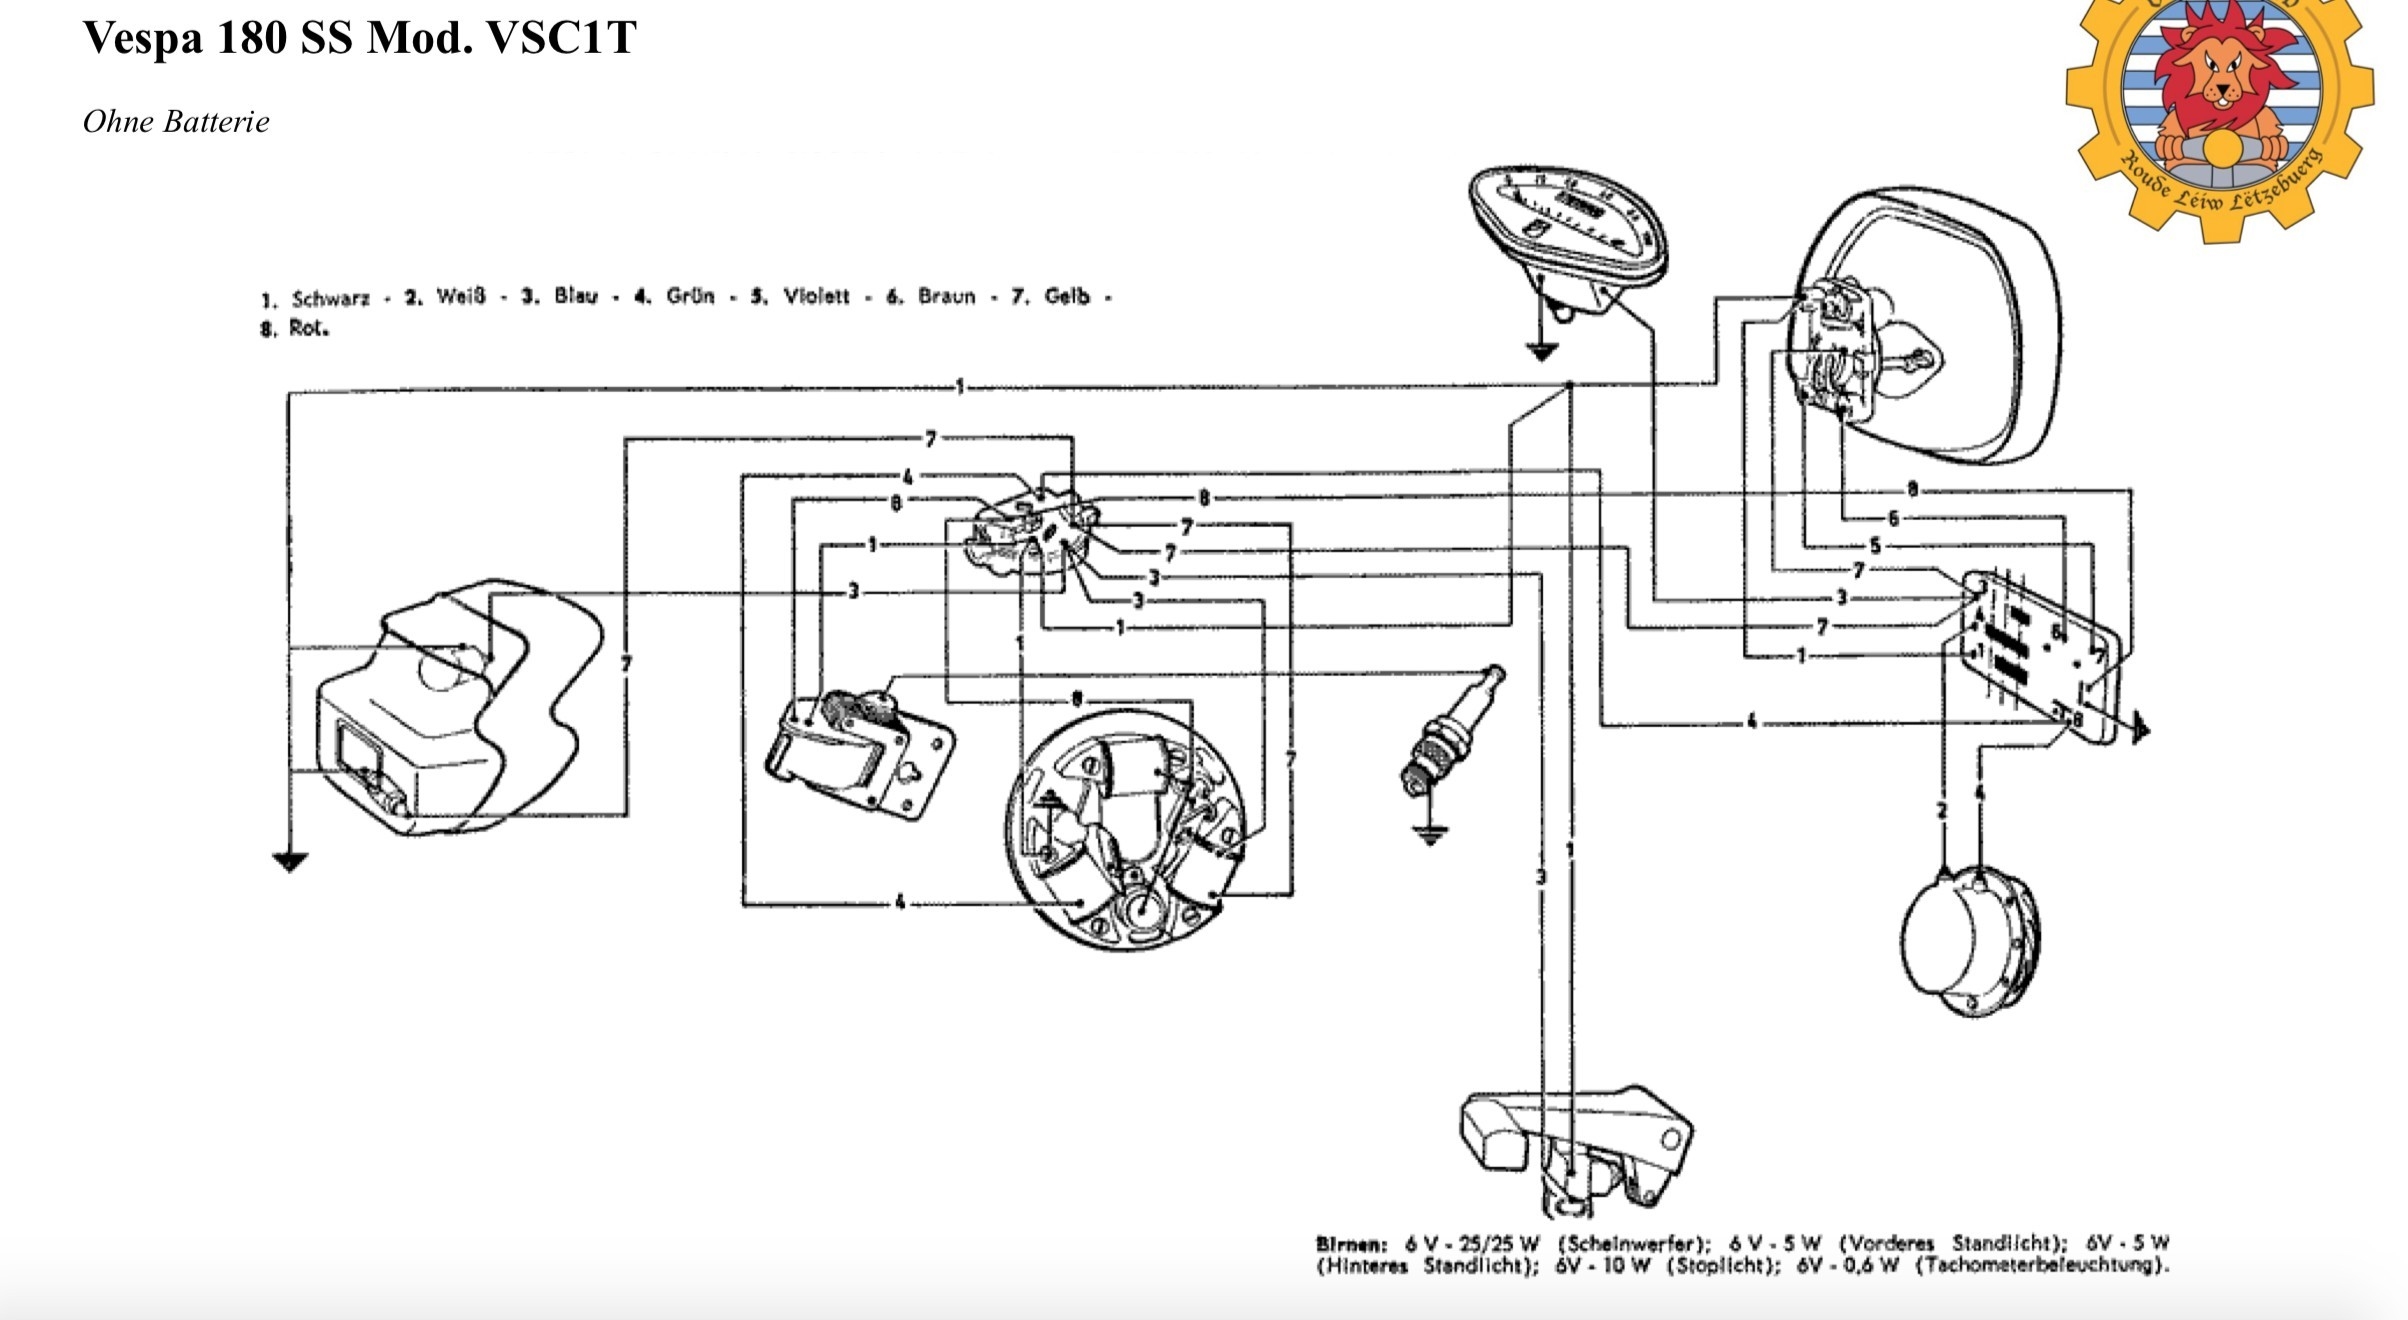 1997 toyota Corolla Engine Diagram 2002 toyota Corolla Engine Diagram File  1997 toyota Corolla Ae101r Of